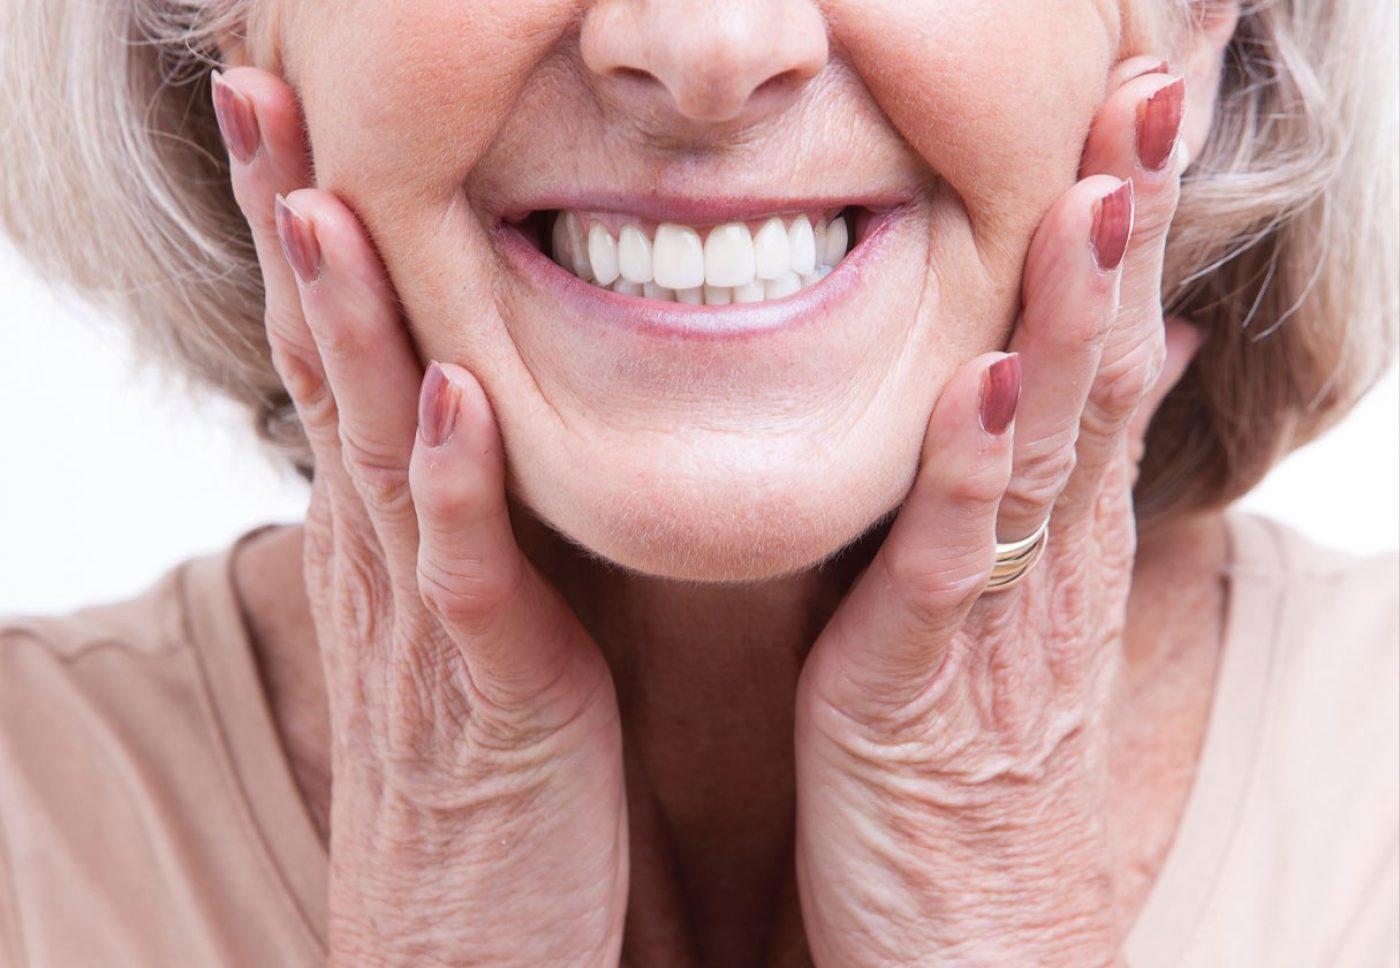 Dentures Portman Dental And Implant Clinic Maidenhead